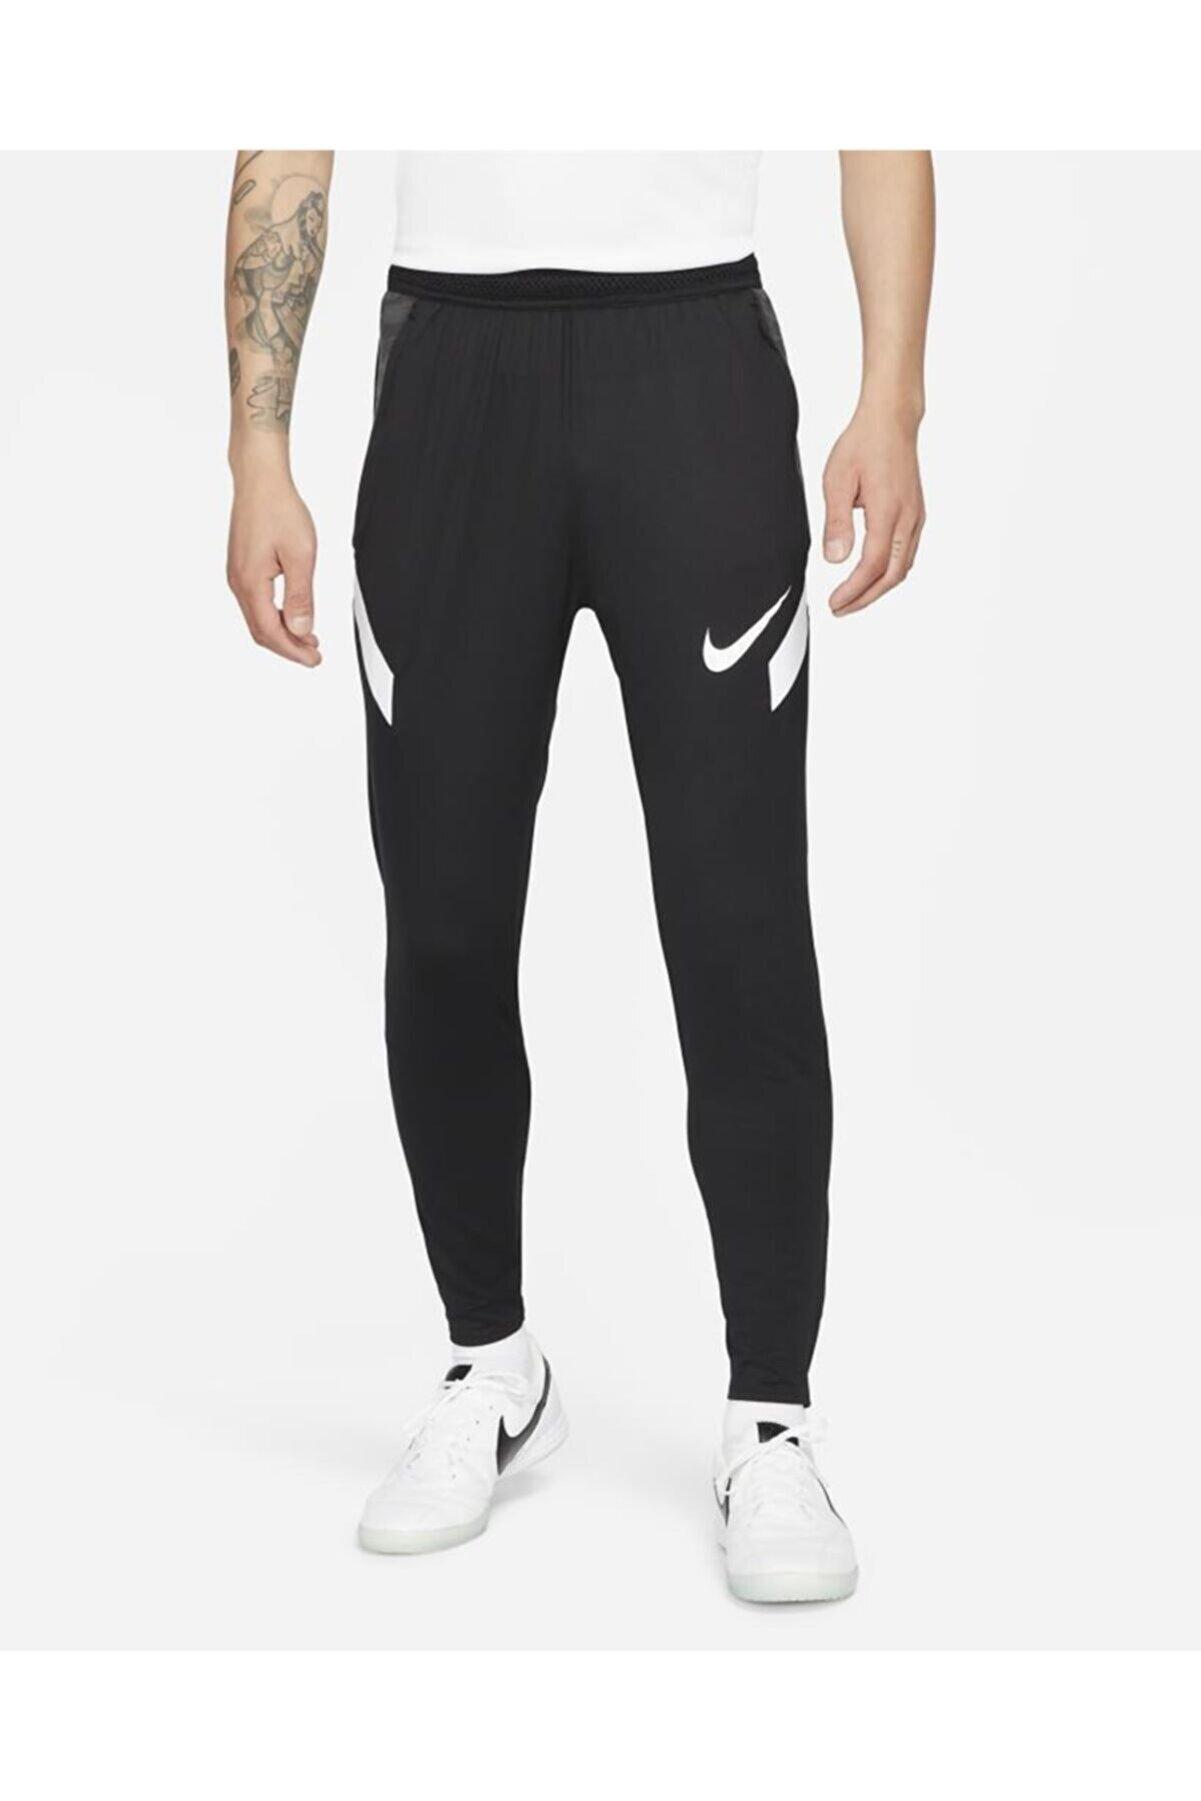 Nike Dri-fit Strike Trousers Erkek Eşofman Altı Cw5862-010